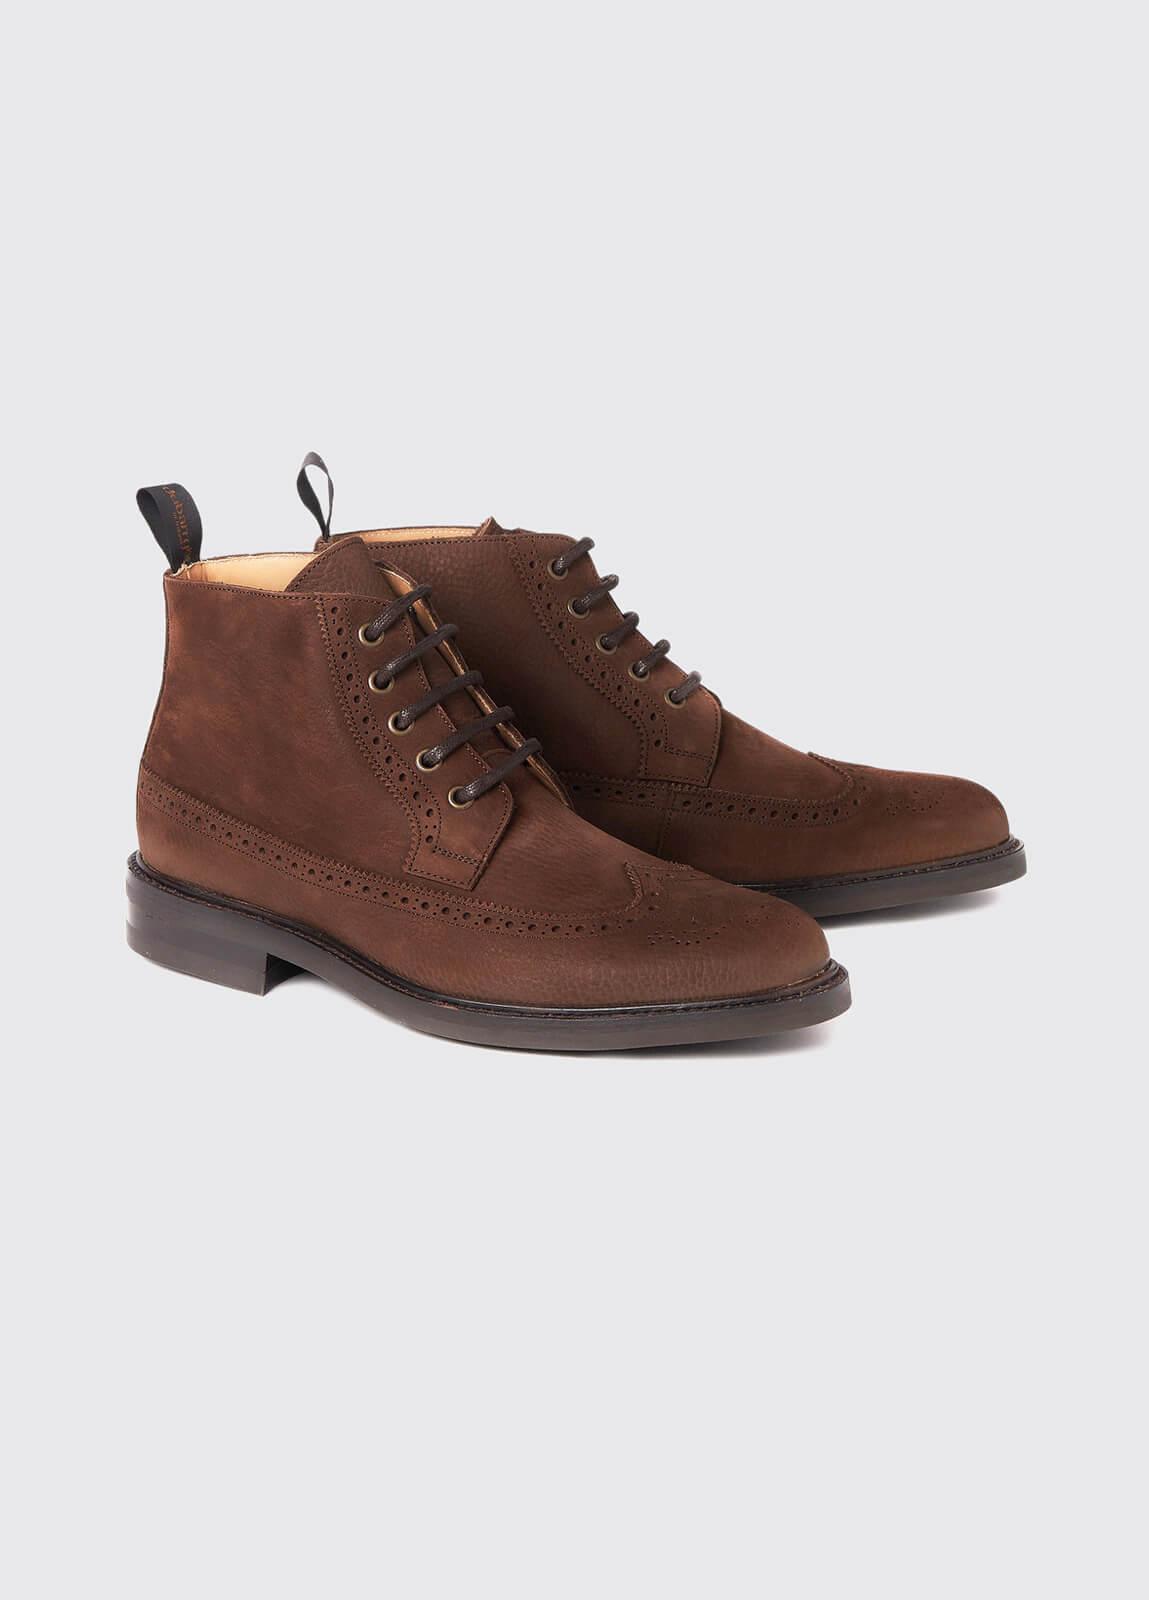 Down Goodyear Brogue Boot - Walnut